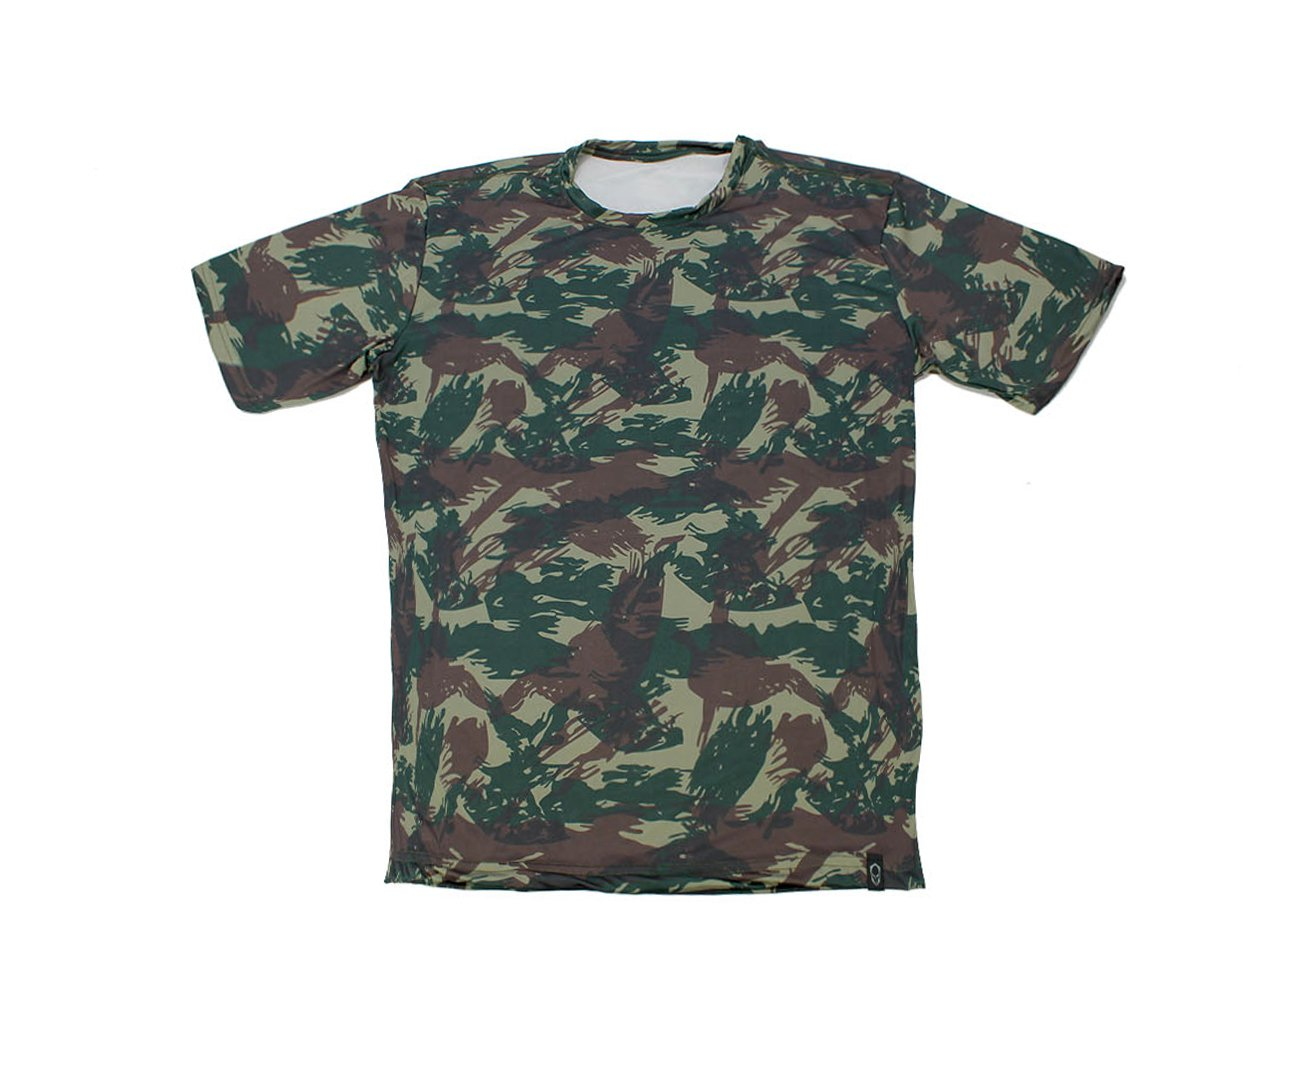 Camiseta Bravo Dry Camuflada Selva 2-cmf Eb